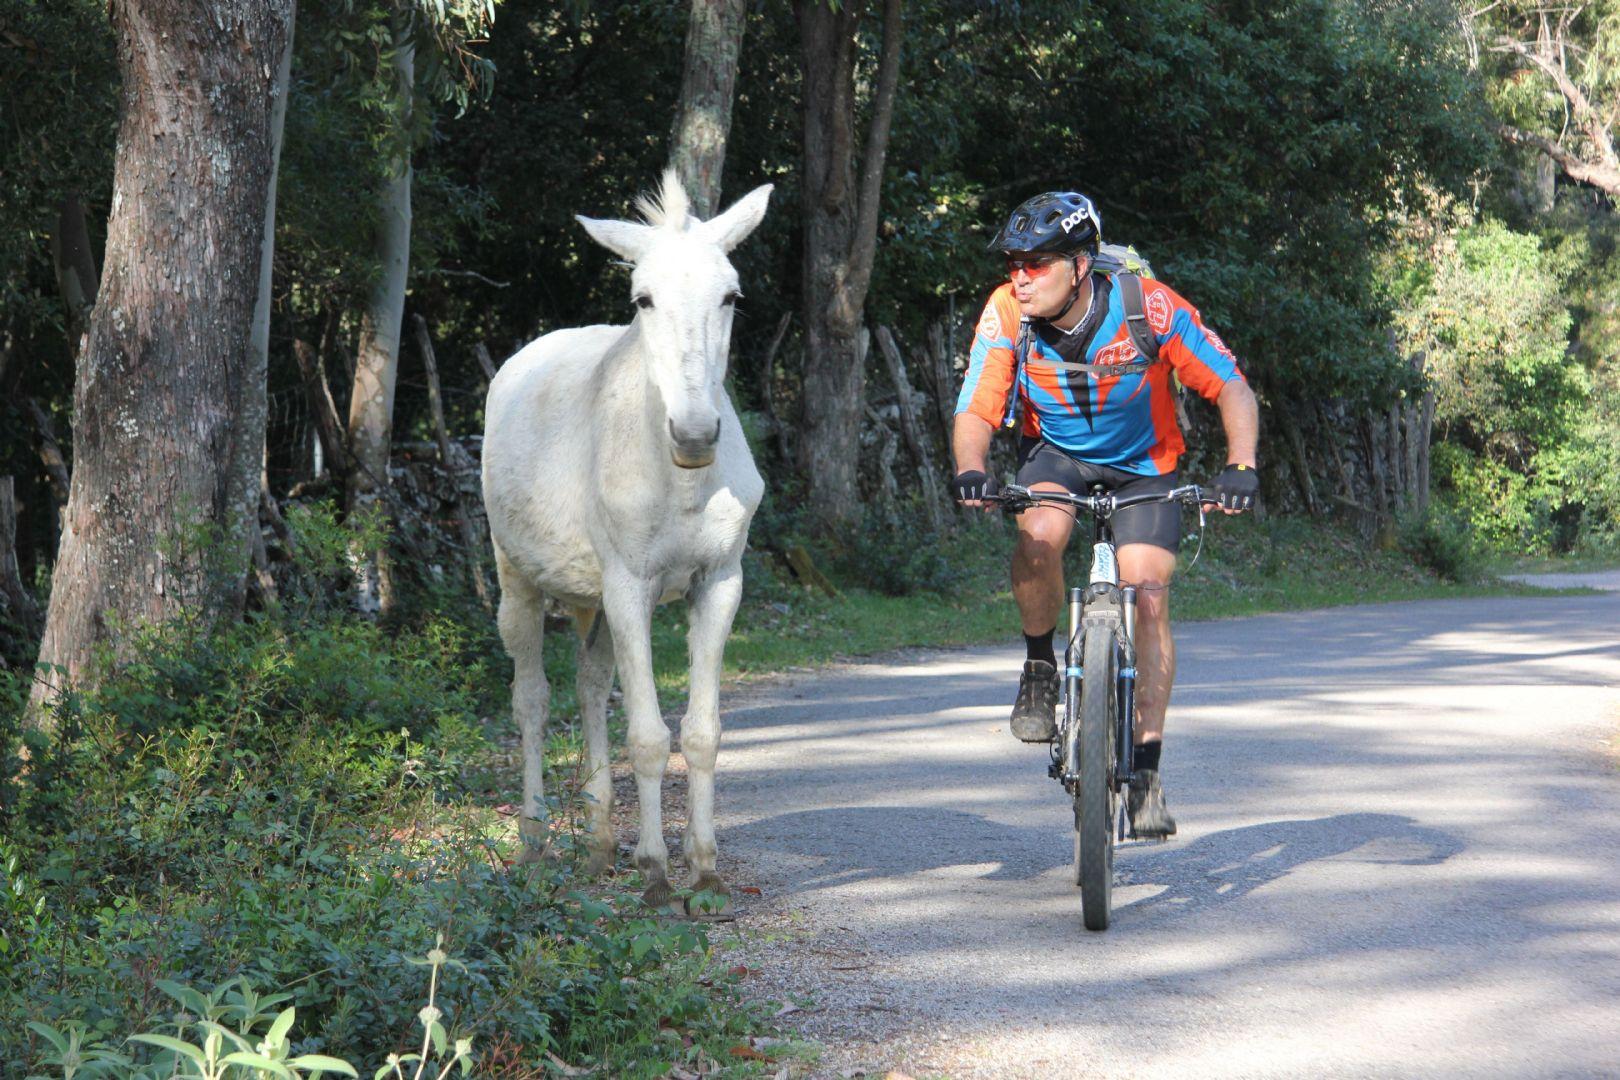 IMG_9208.JPG - Spain - Trans Andaluz - Mountain Biking